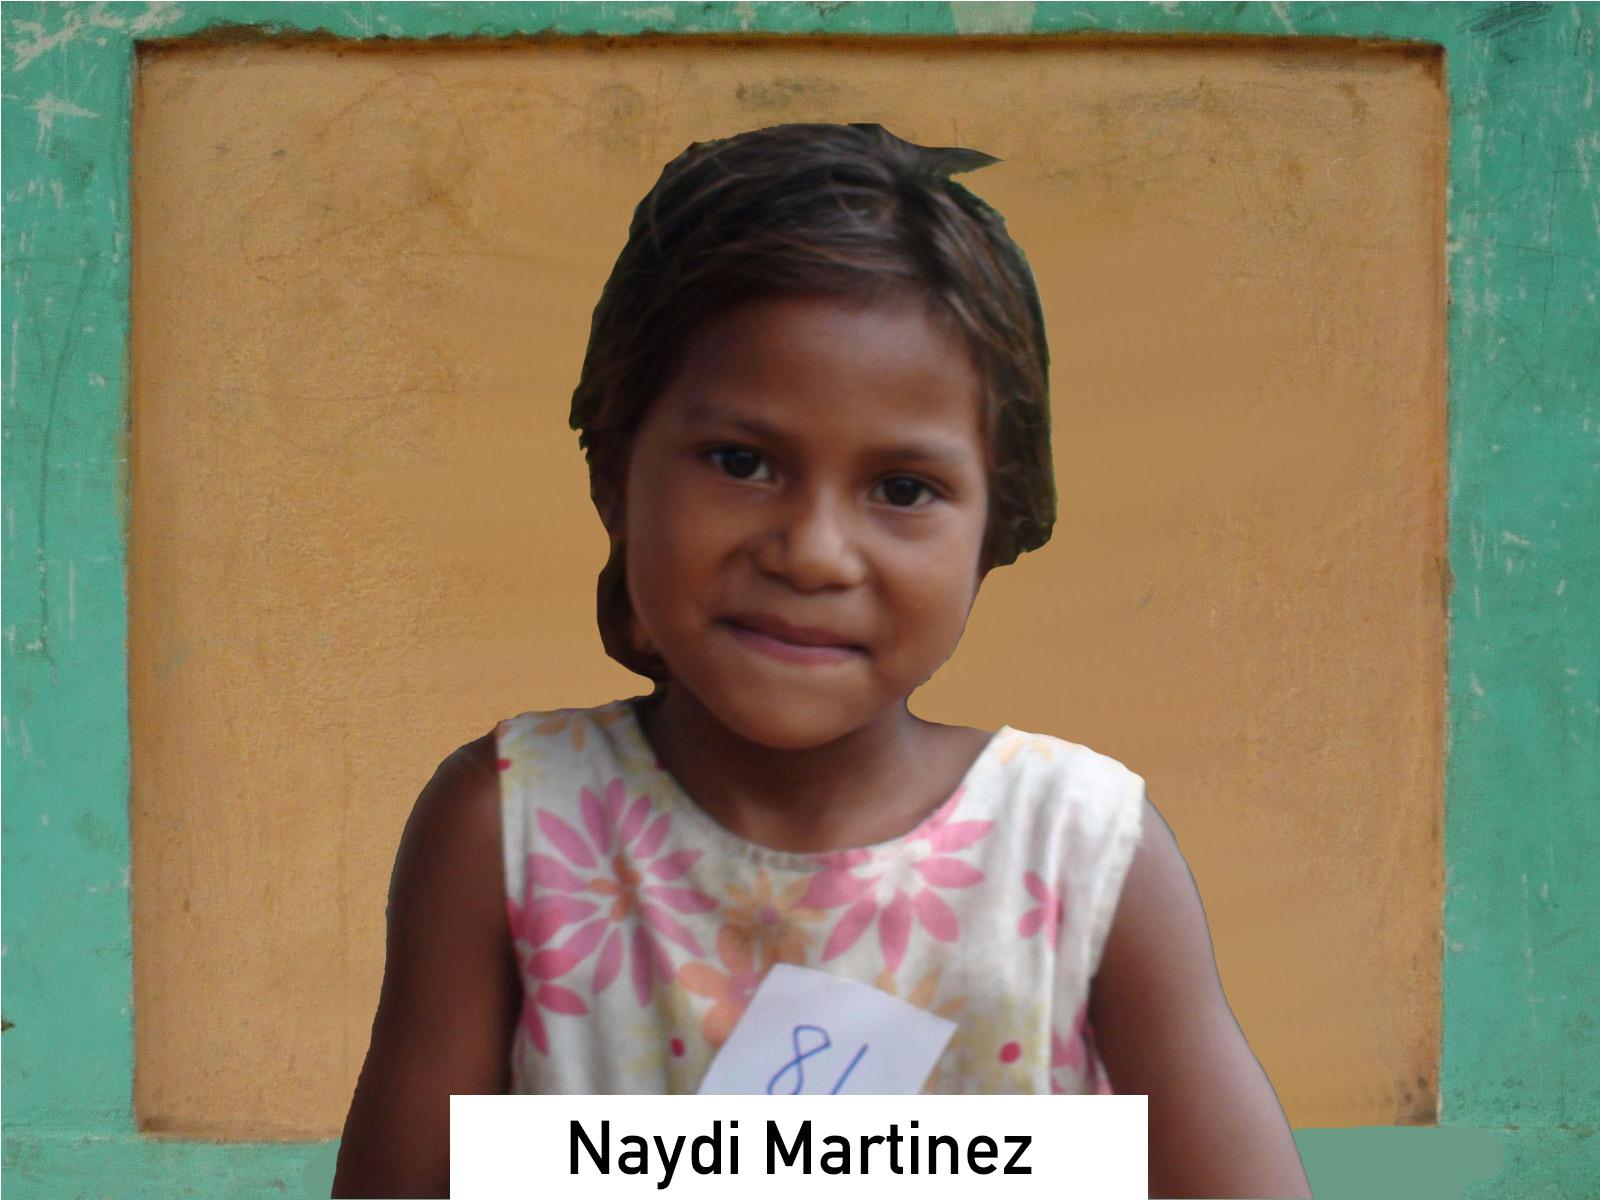 081 - Naydi Martinez.jpg